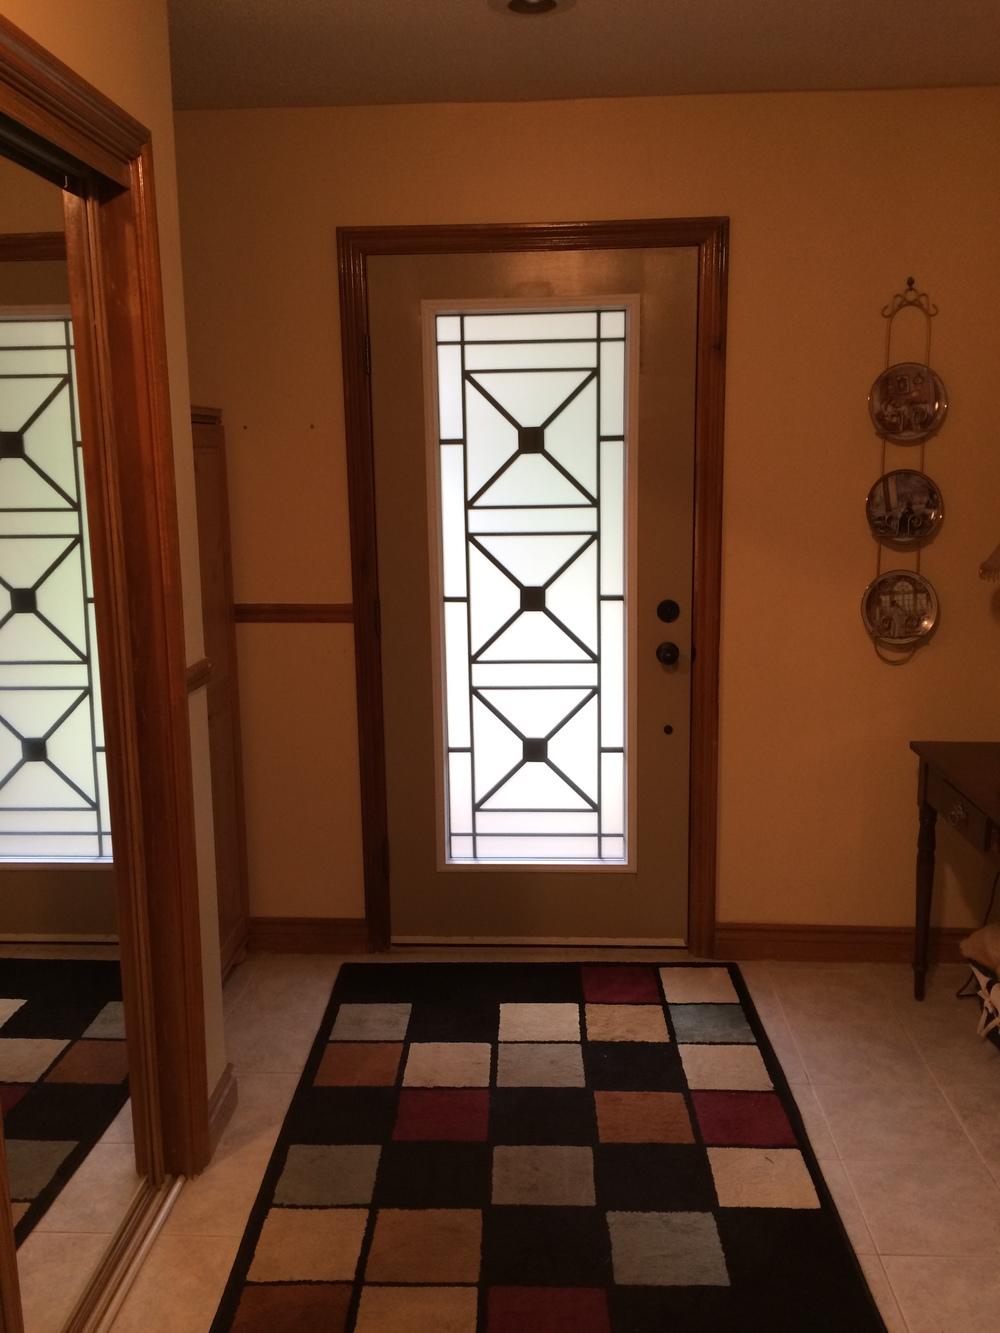 Century-Wrought-Iron-Glass-Door-Inserts-Ancaster-Ontario